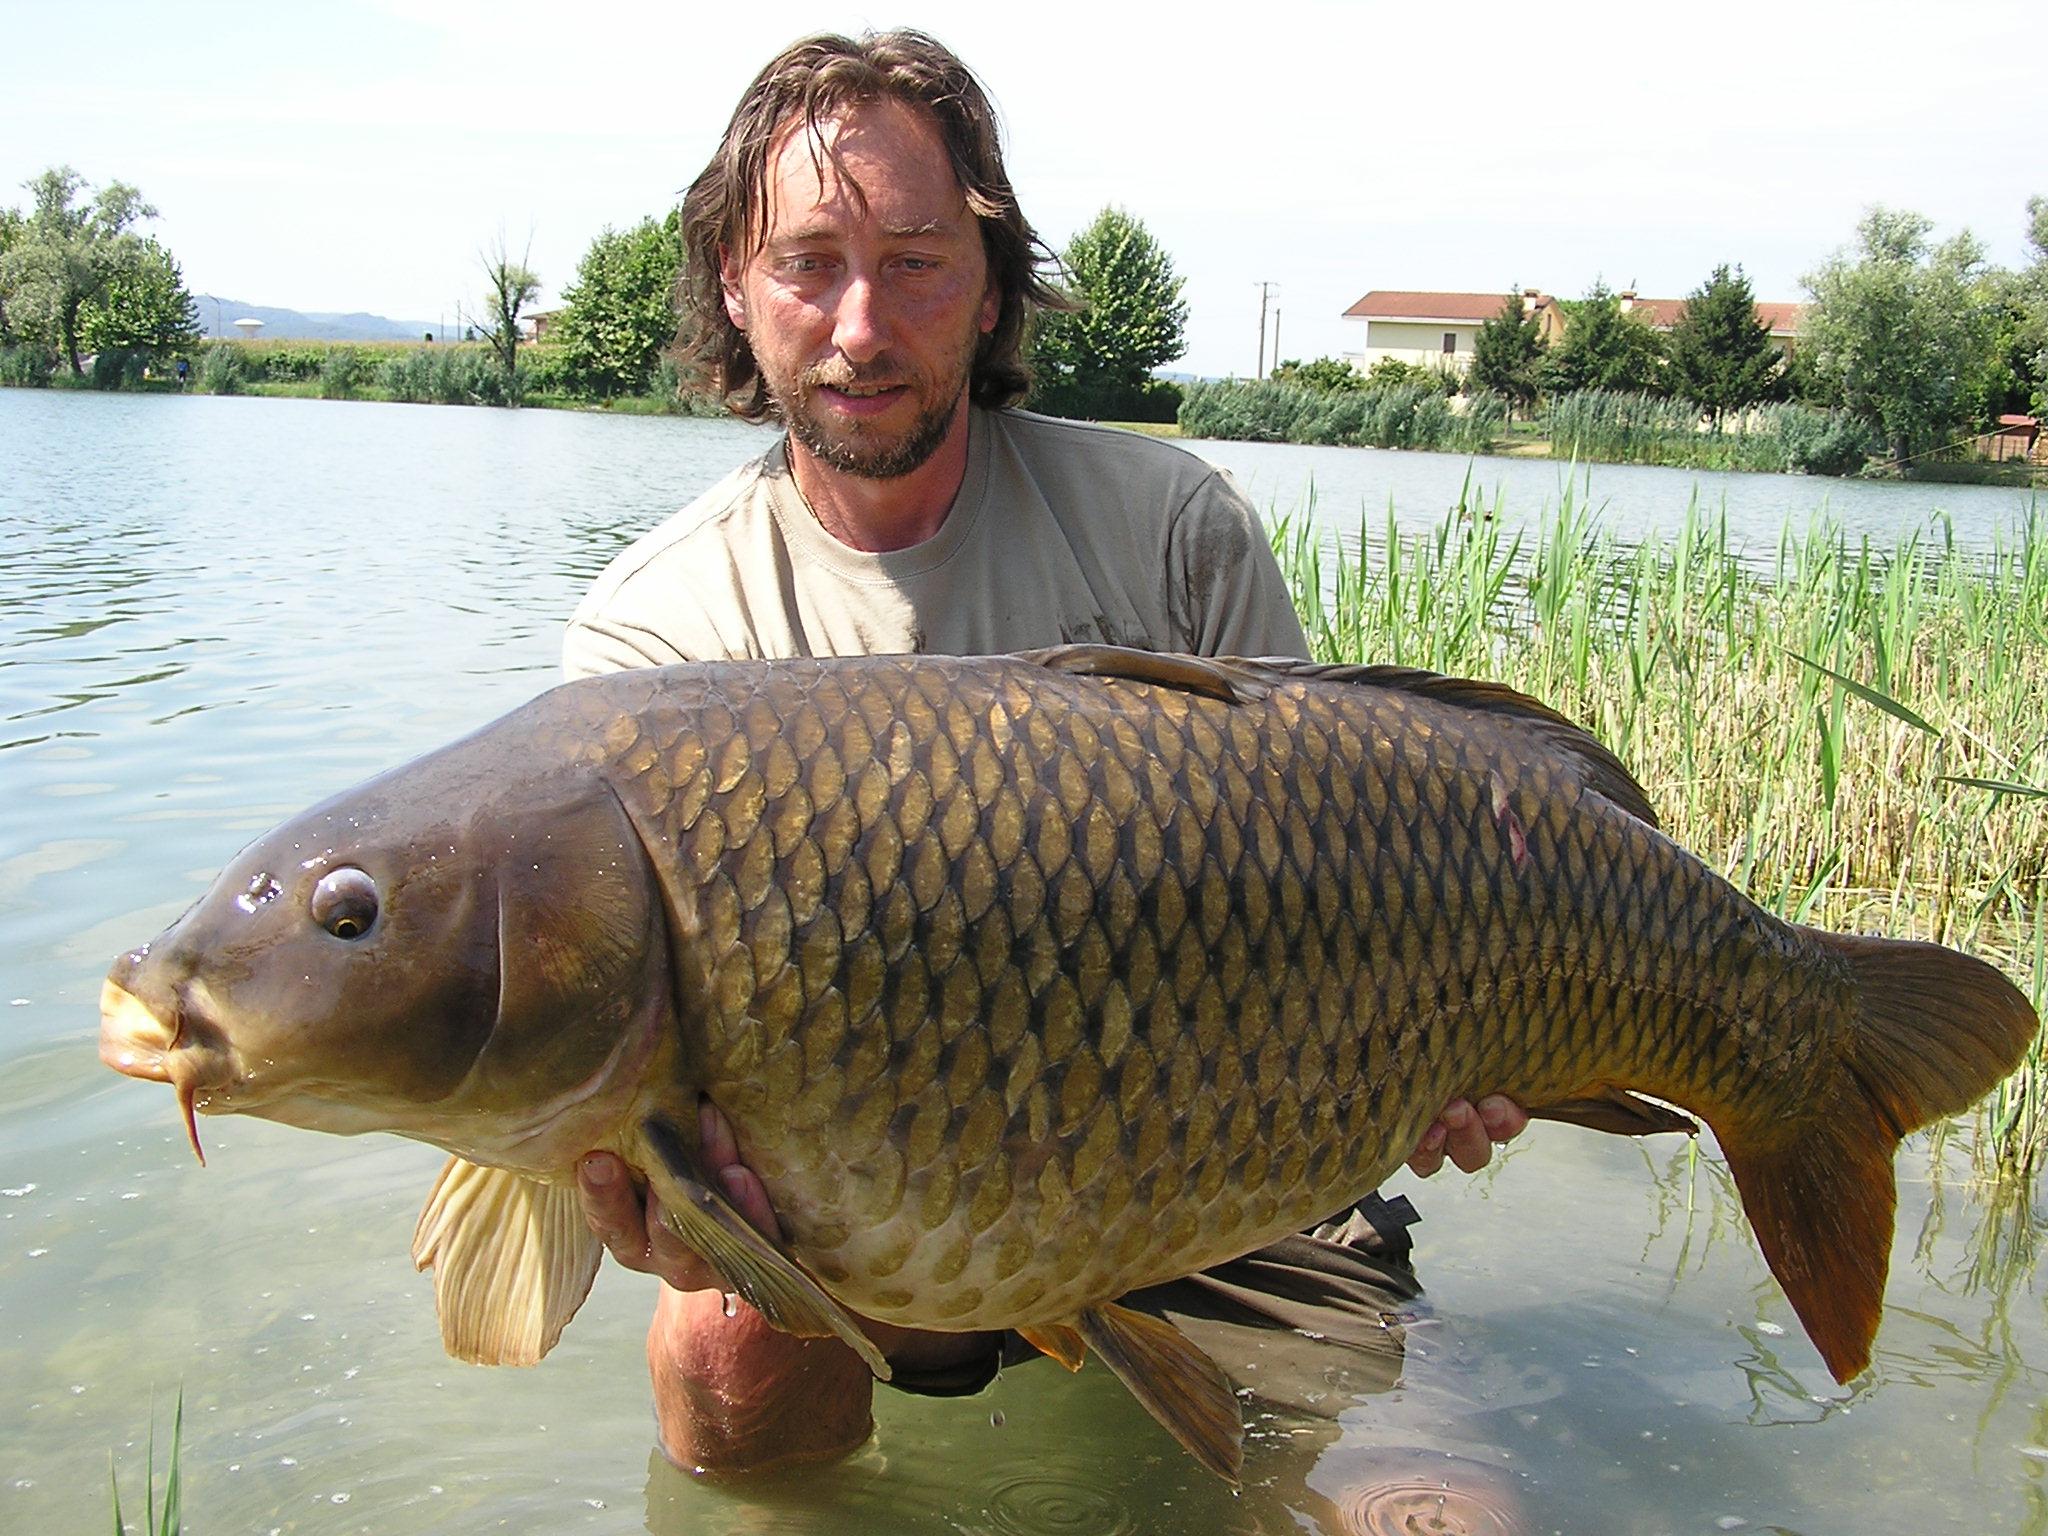 Norbert mit Karpfen aus einem Pay Lake